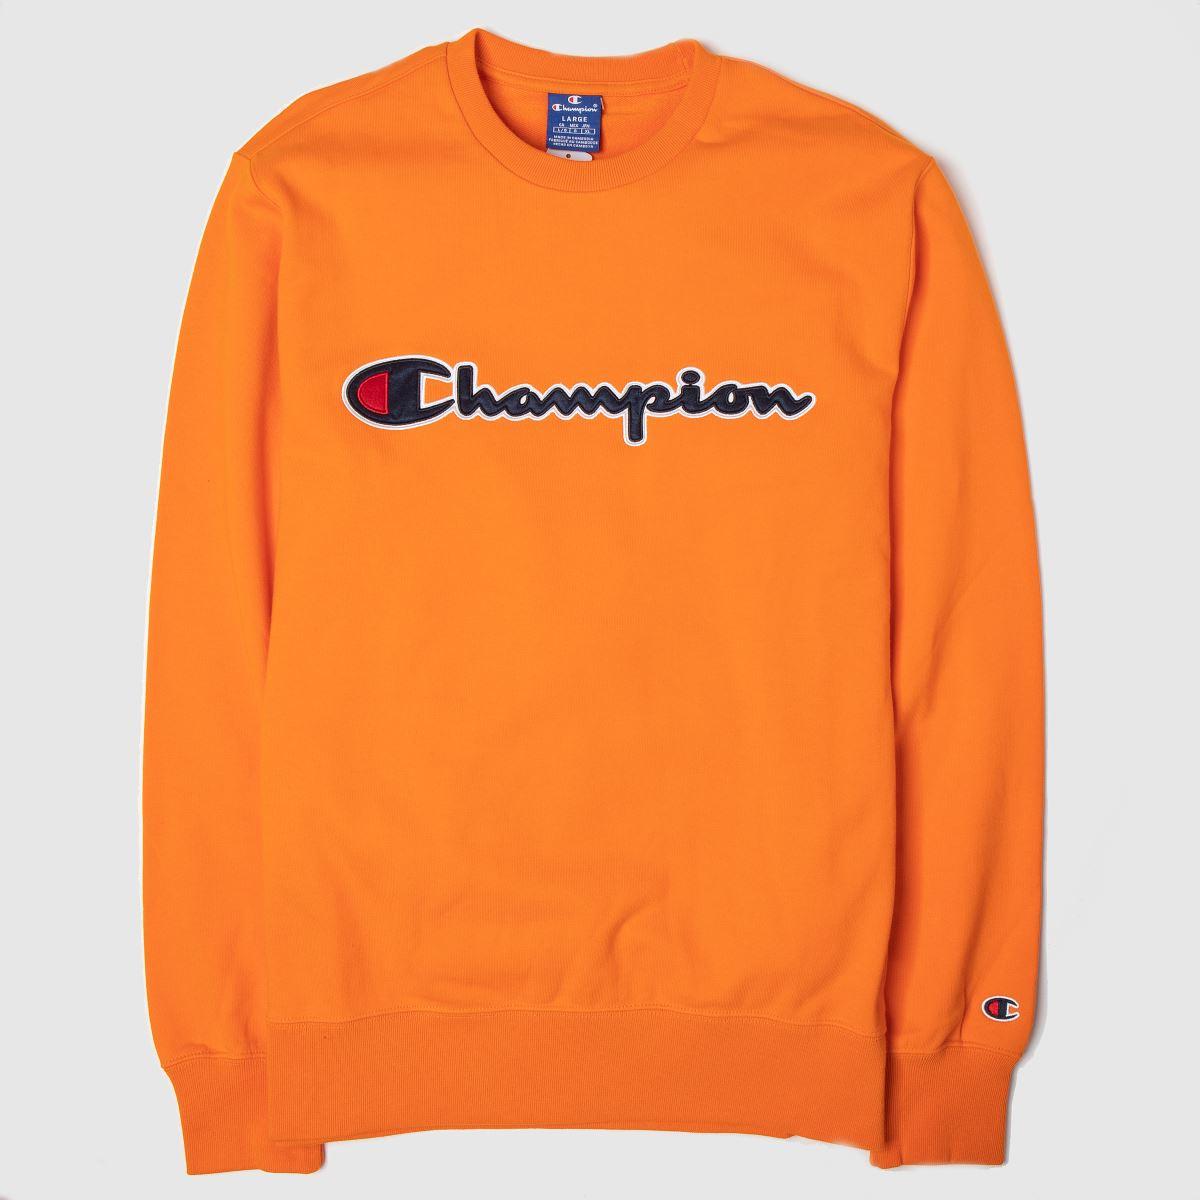 Champion Clothing Champion Orange Crewneck Sweatshirt